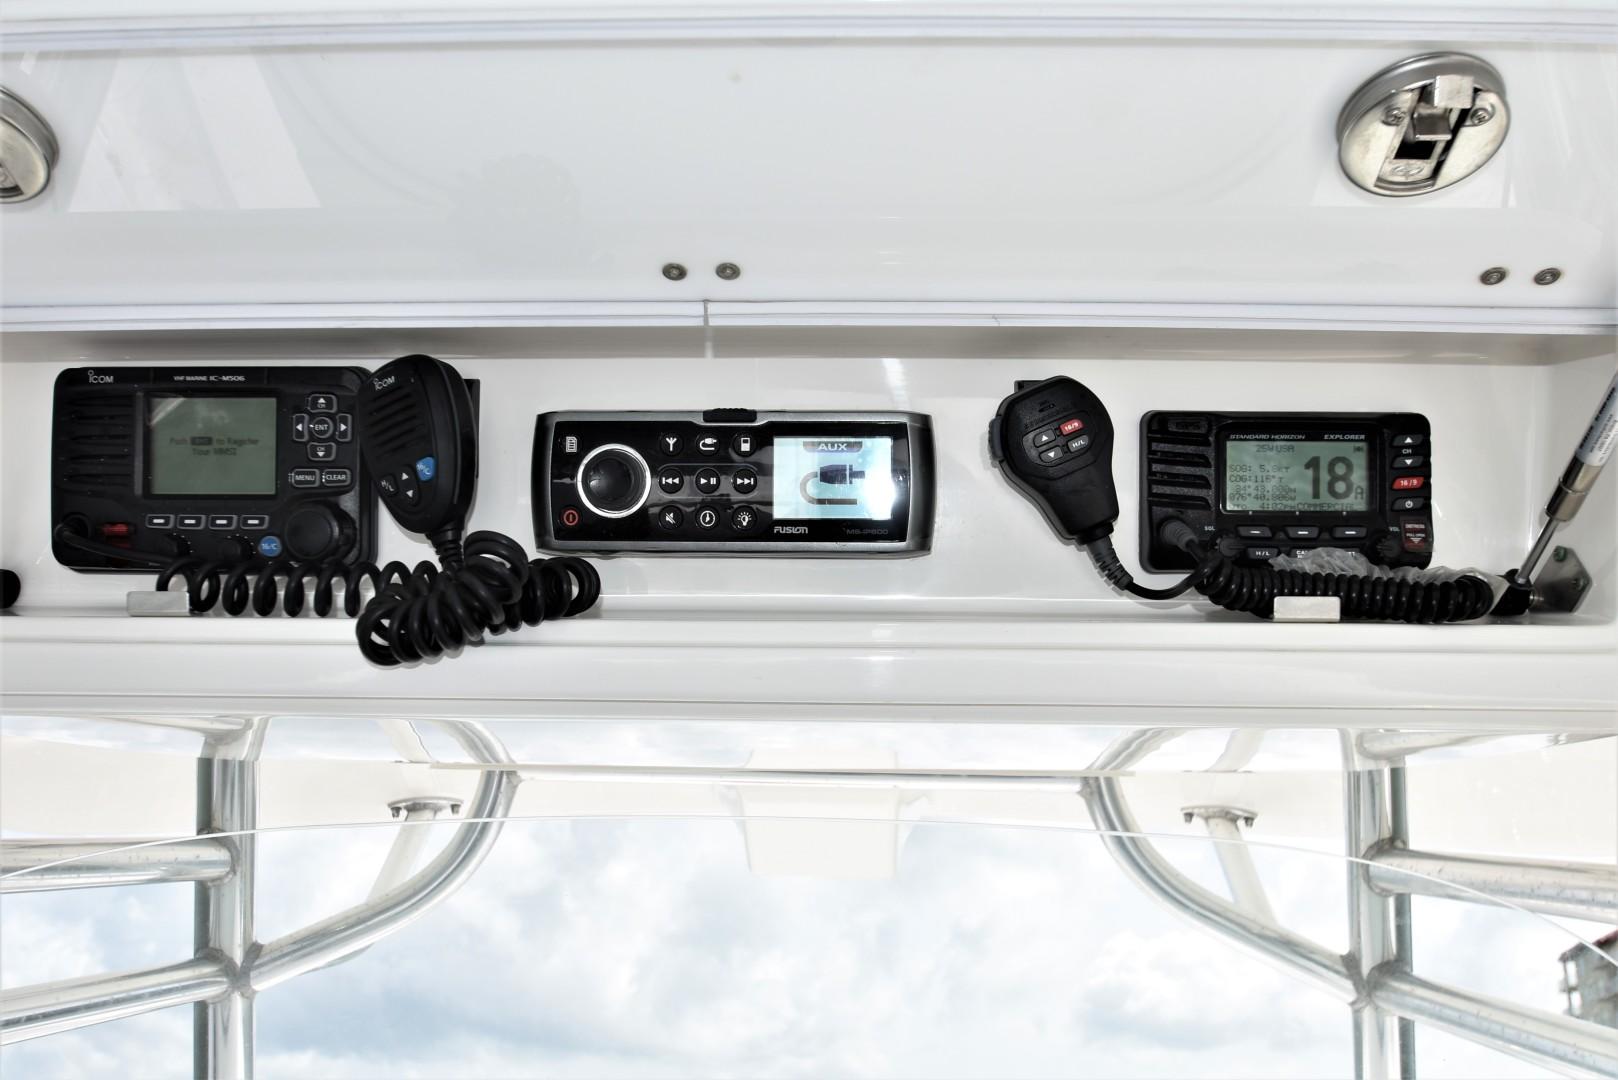 Regulator-34SS Center Console 2012-Reel Dirty Beaufort-North Carolina-United States-1235005 | Thumbnail